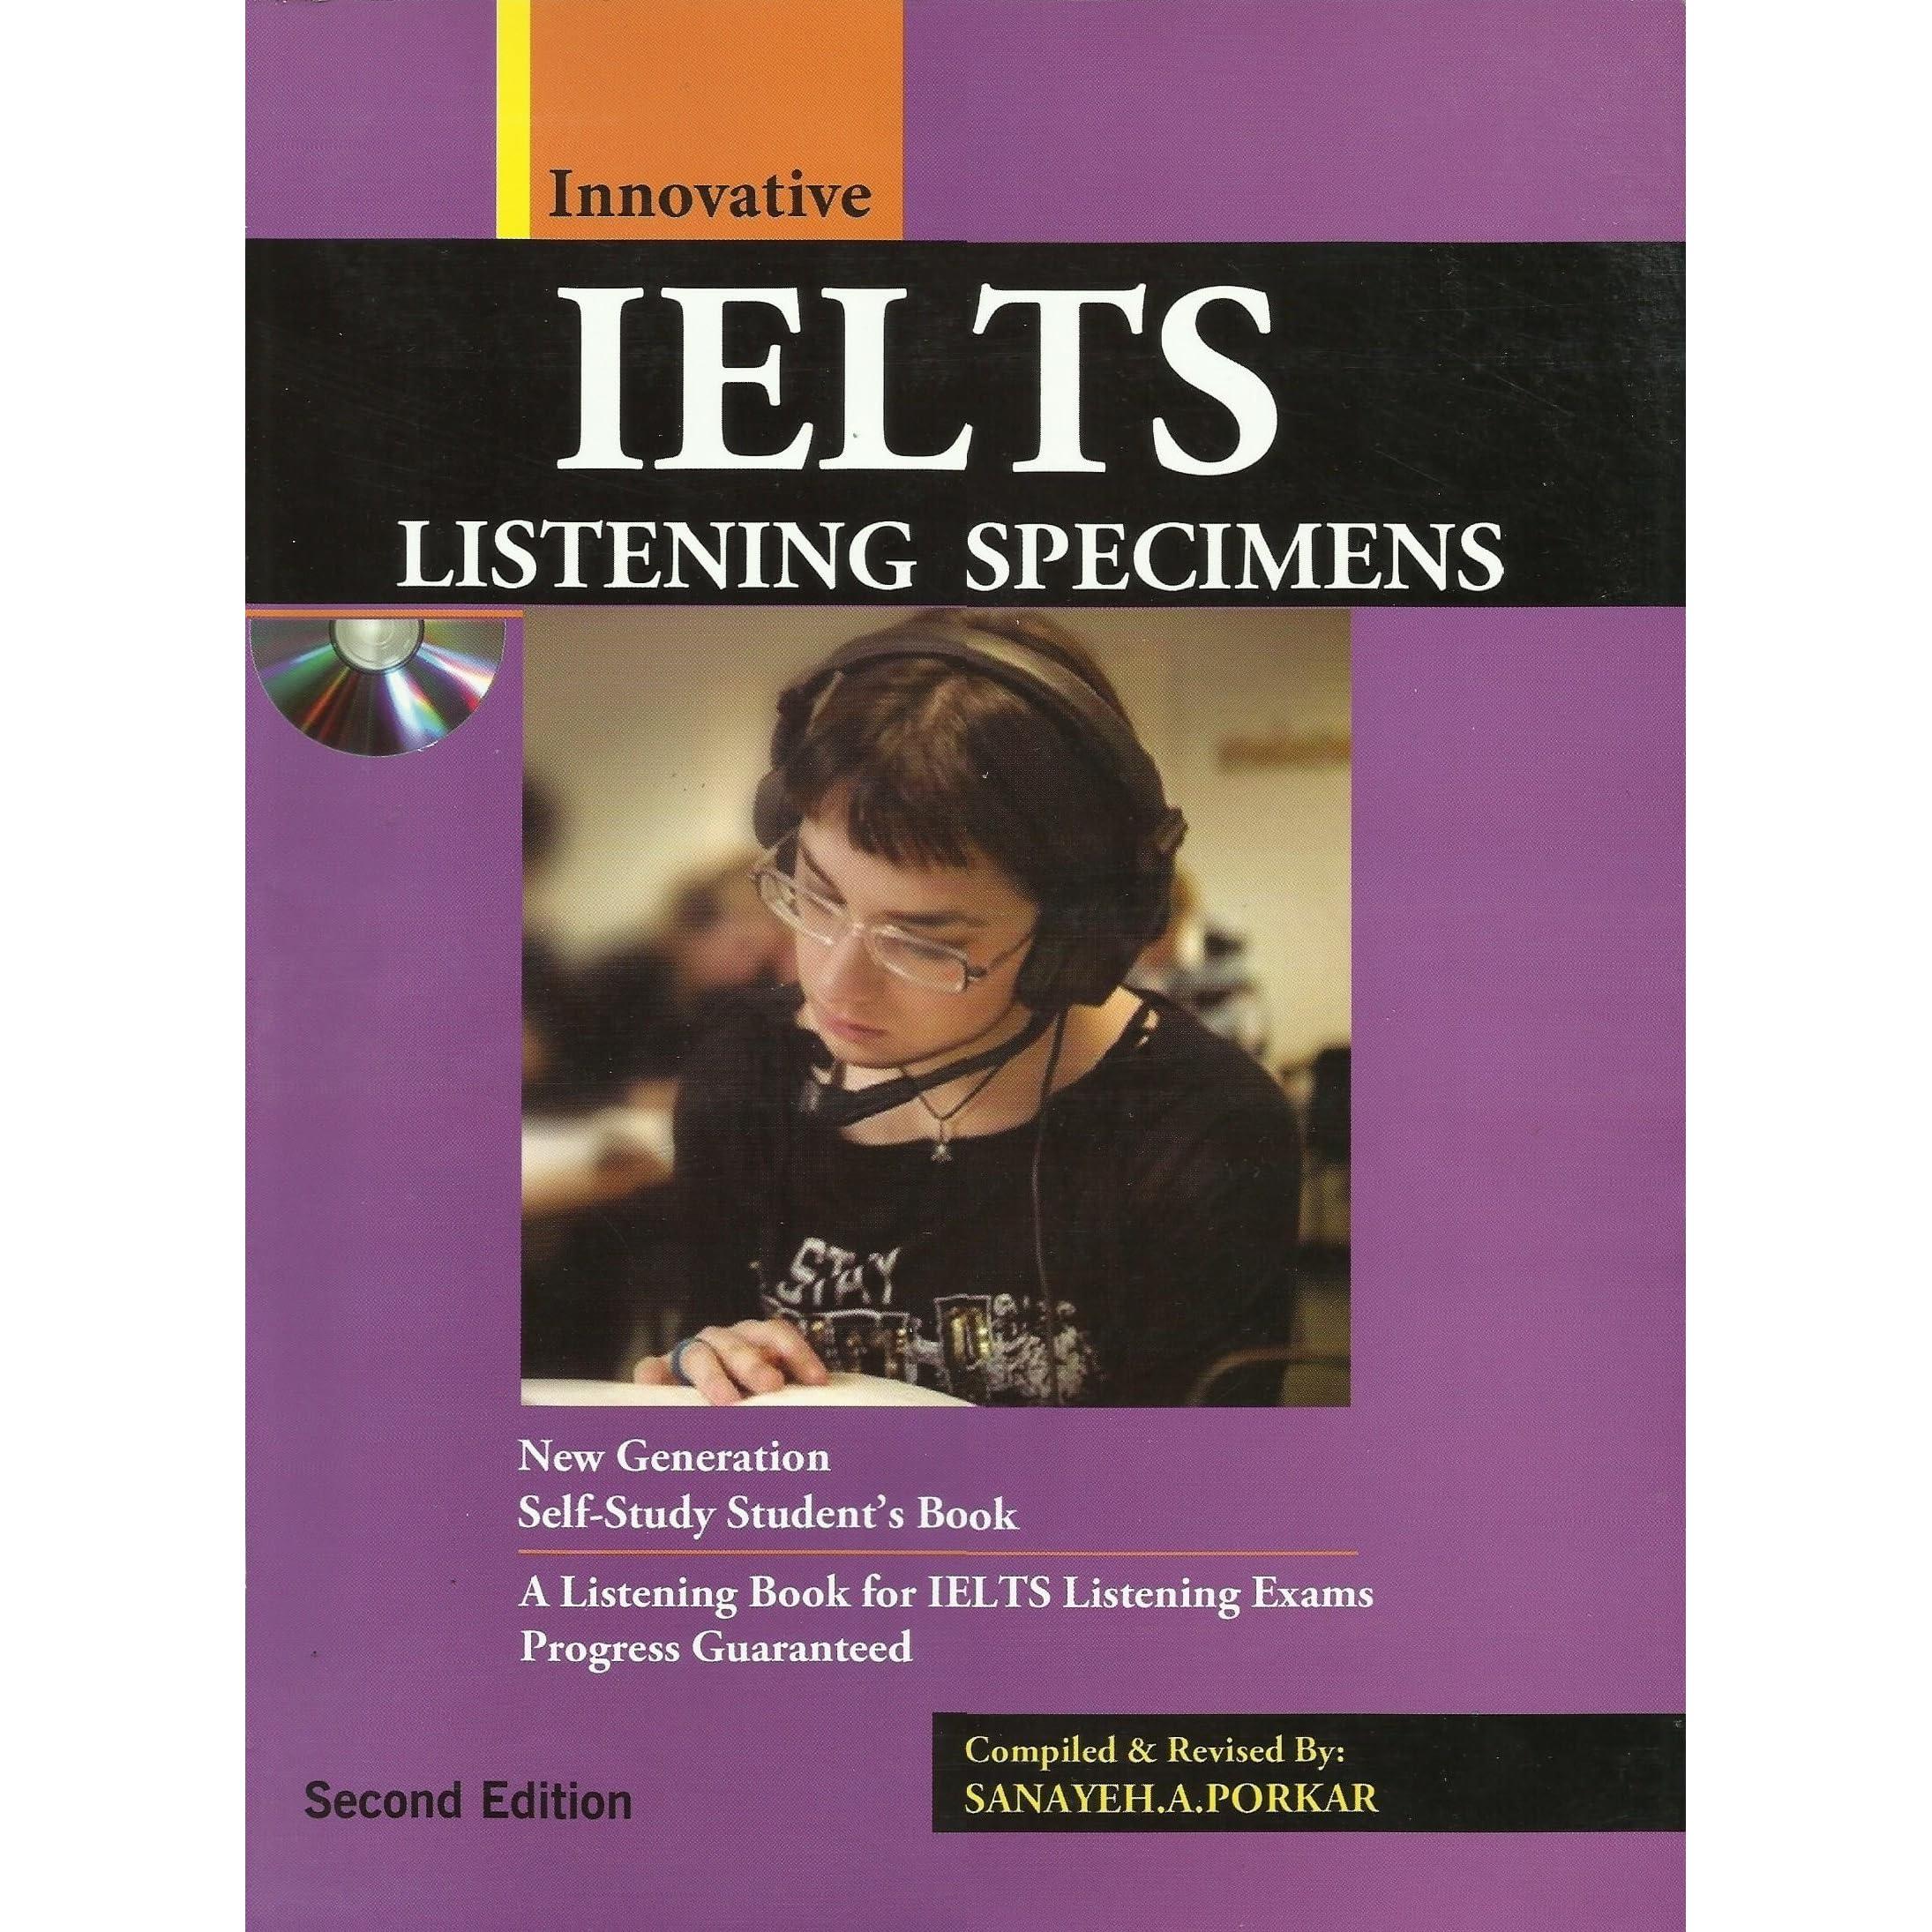 IELTS LISTENING SPECIMENS: New Generation Self Study by